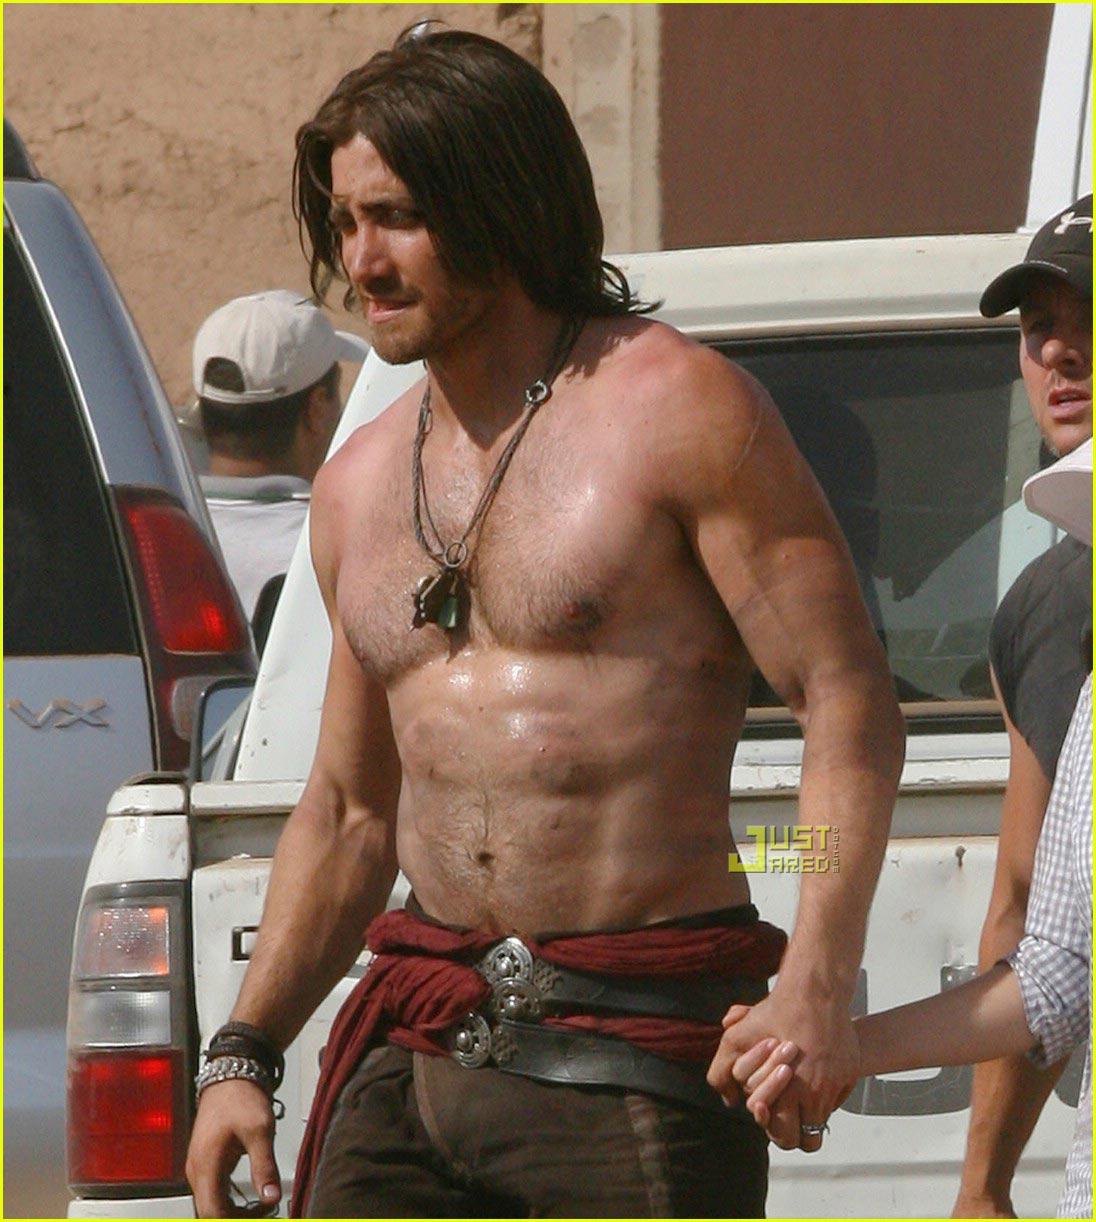 http://4.bp.blogspot.com/_9D3stWe--bQ/S-w049qatOI/AAAAAAAABMY/K6ykzf-HZO4/s1600/jake-gyllenhaal-shirtless-prince-of-persia-04.jpg